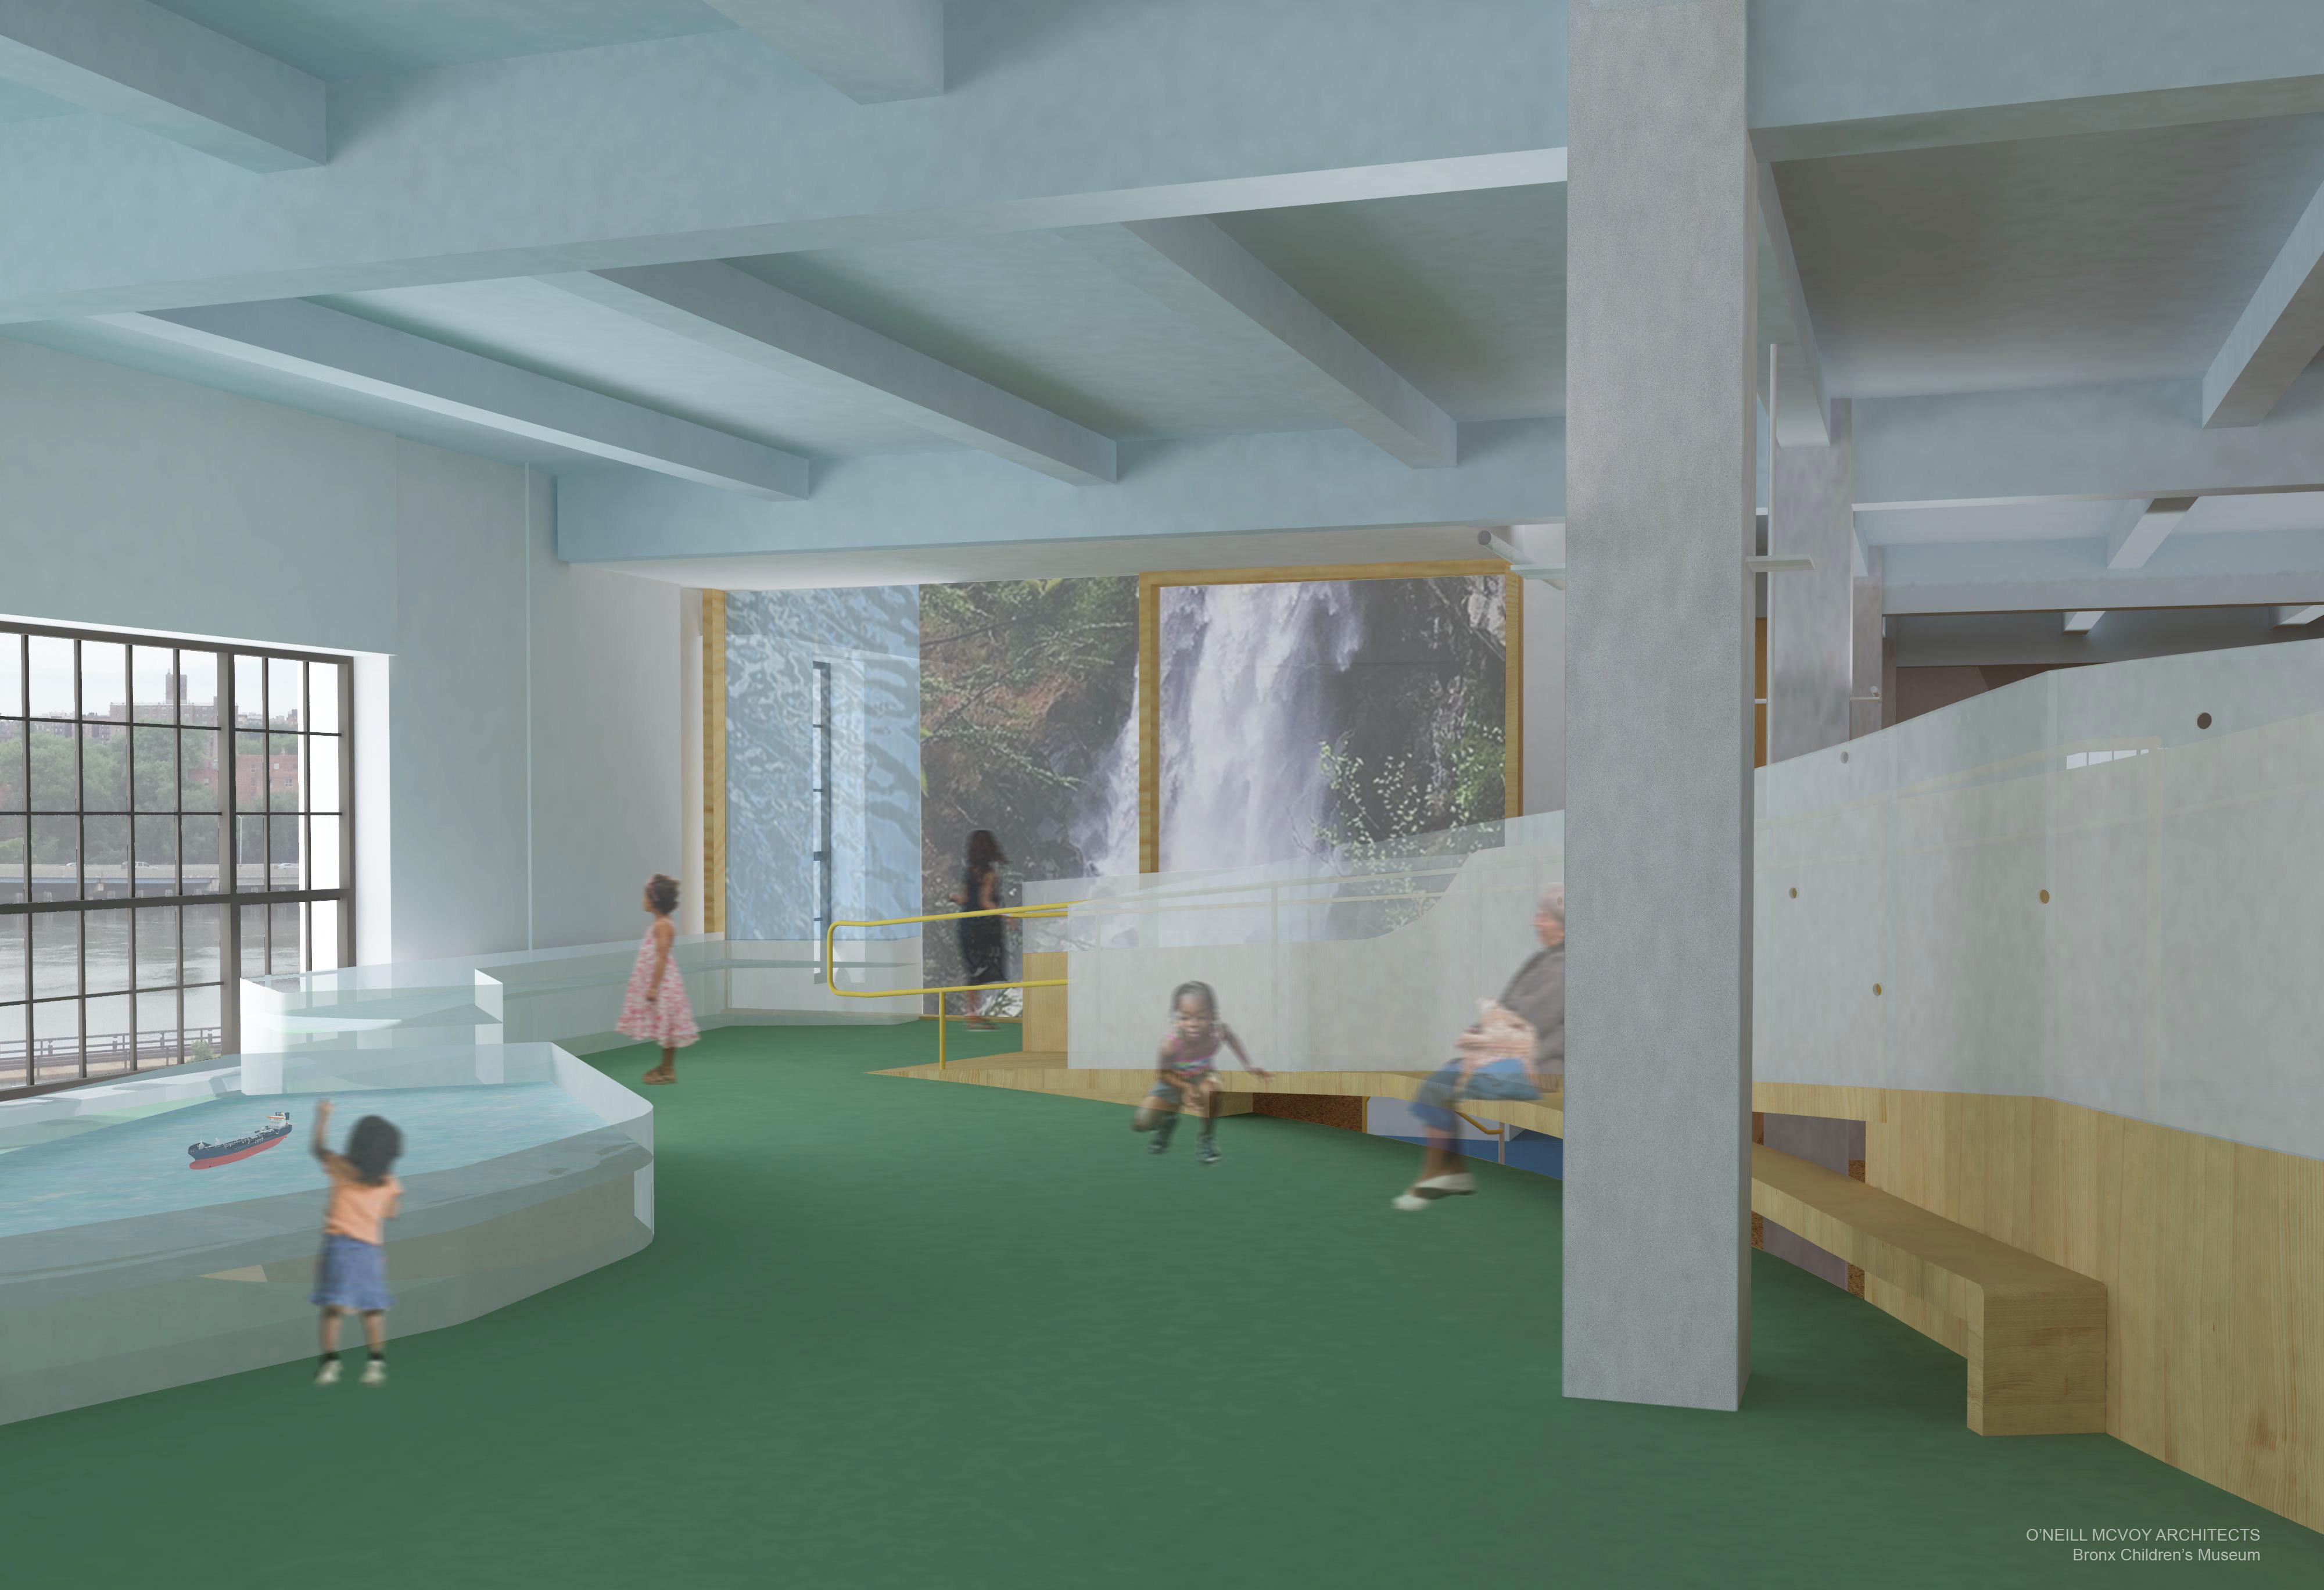 Rendering of the Bronx Children's Museum 2018